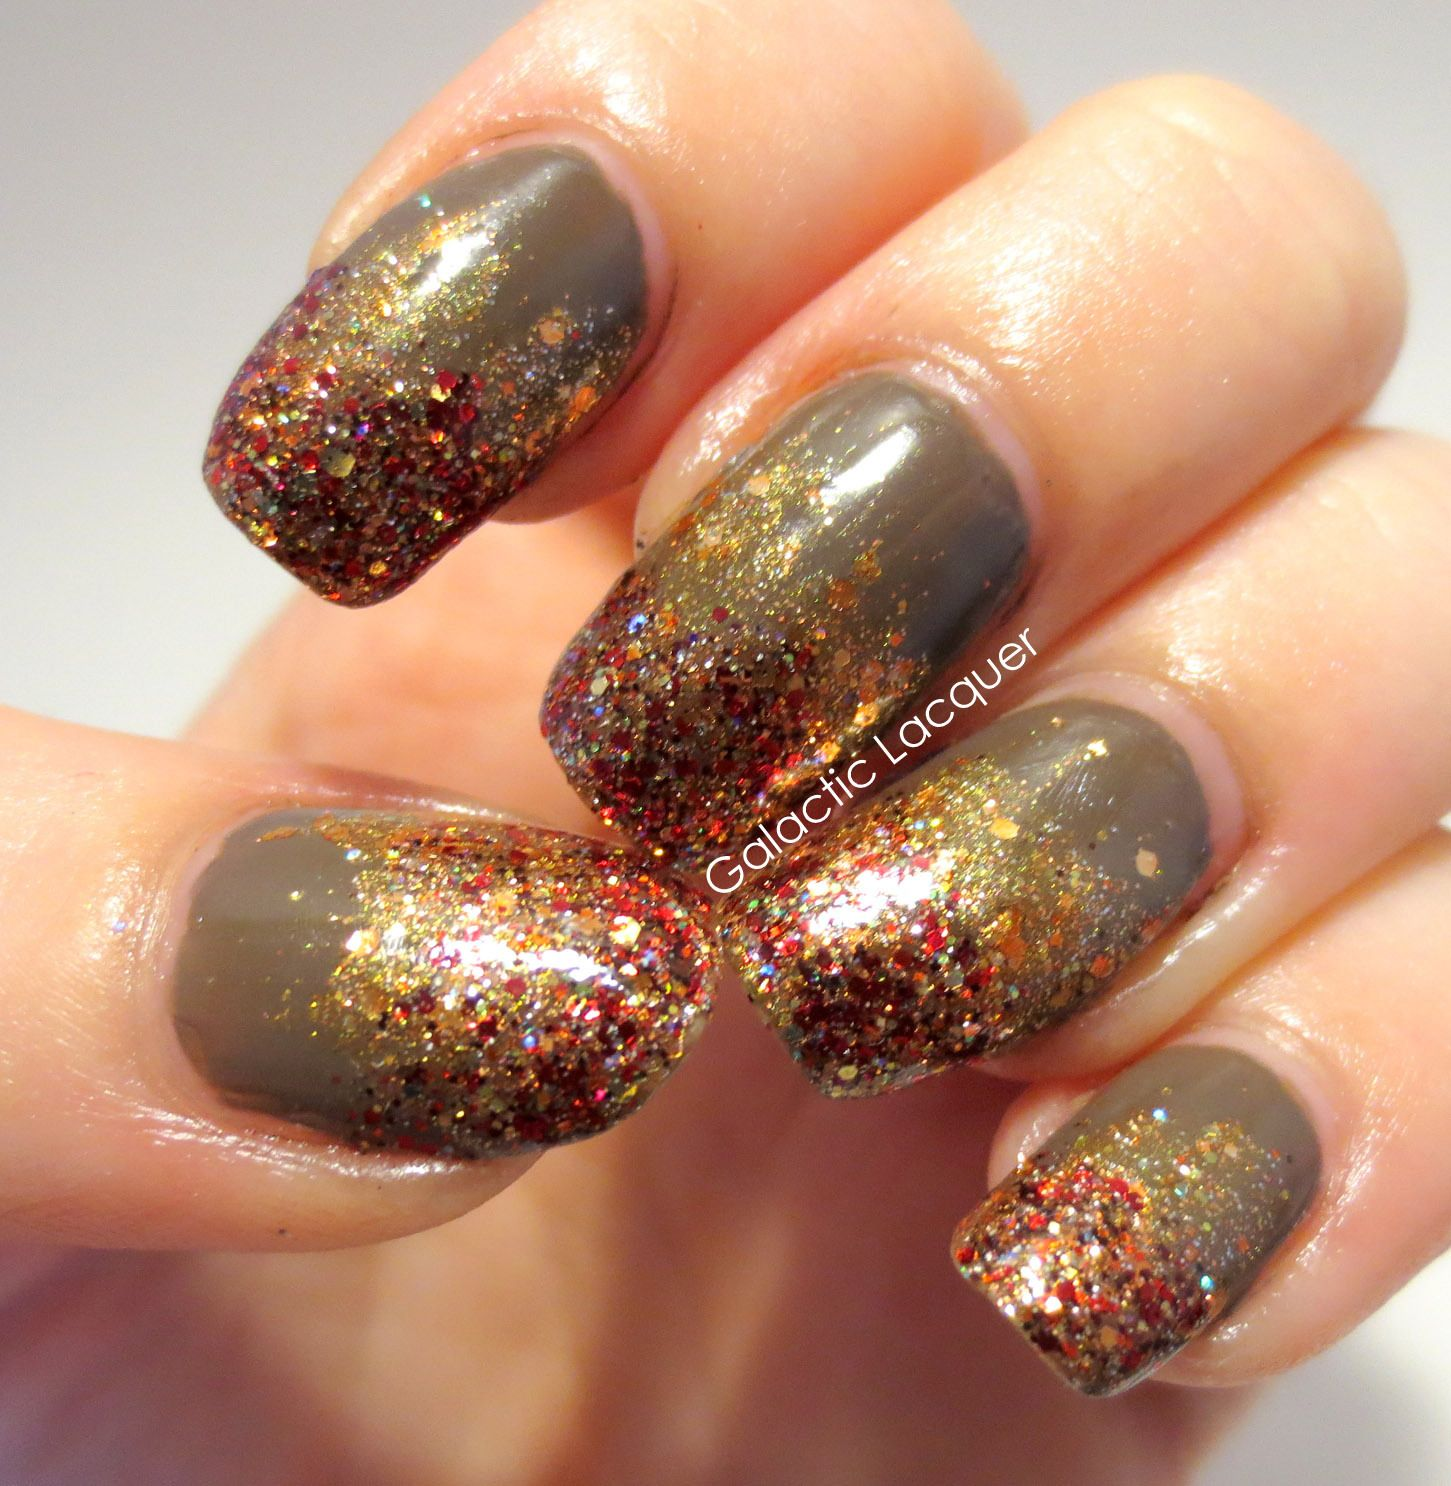 Ombre Glitter Nails!   Nail Designs   Pinterest   Art challenge ...